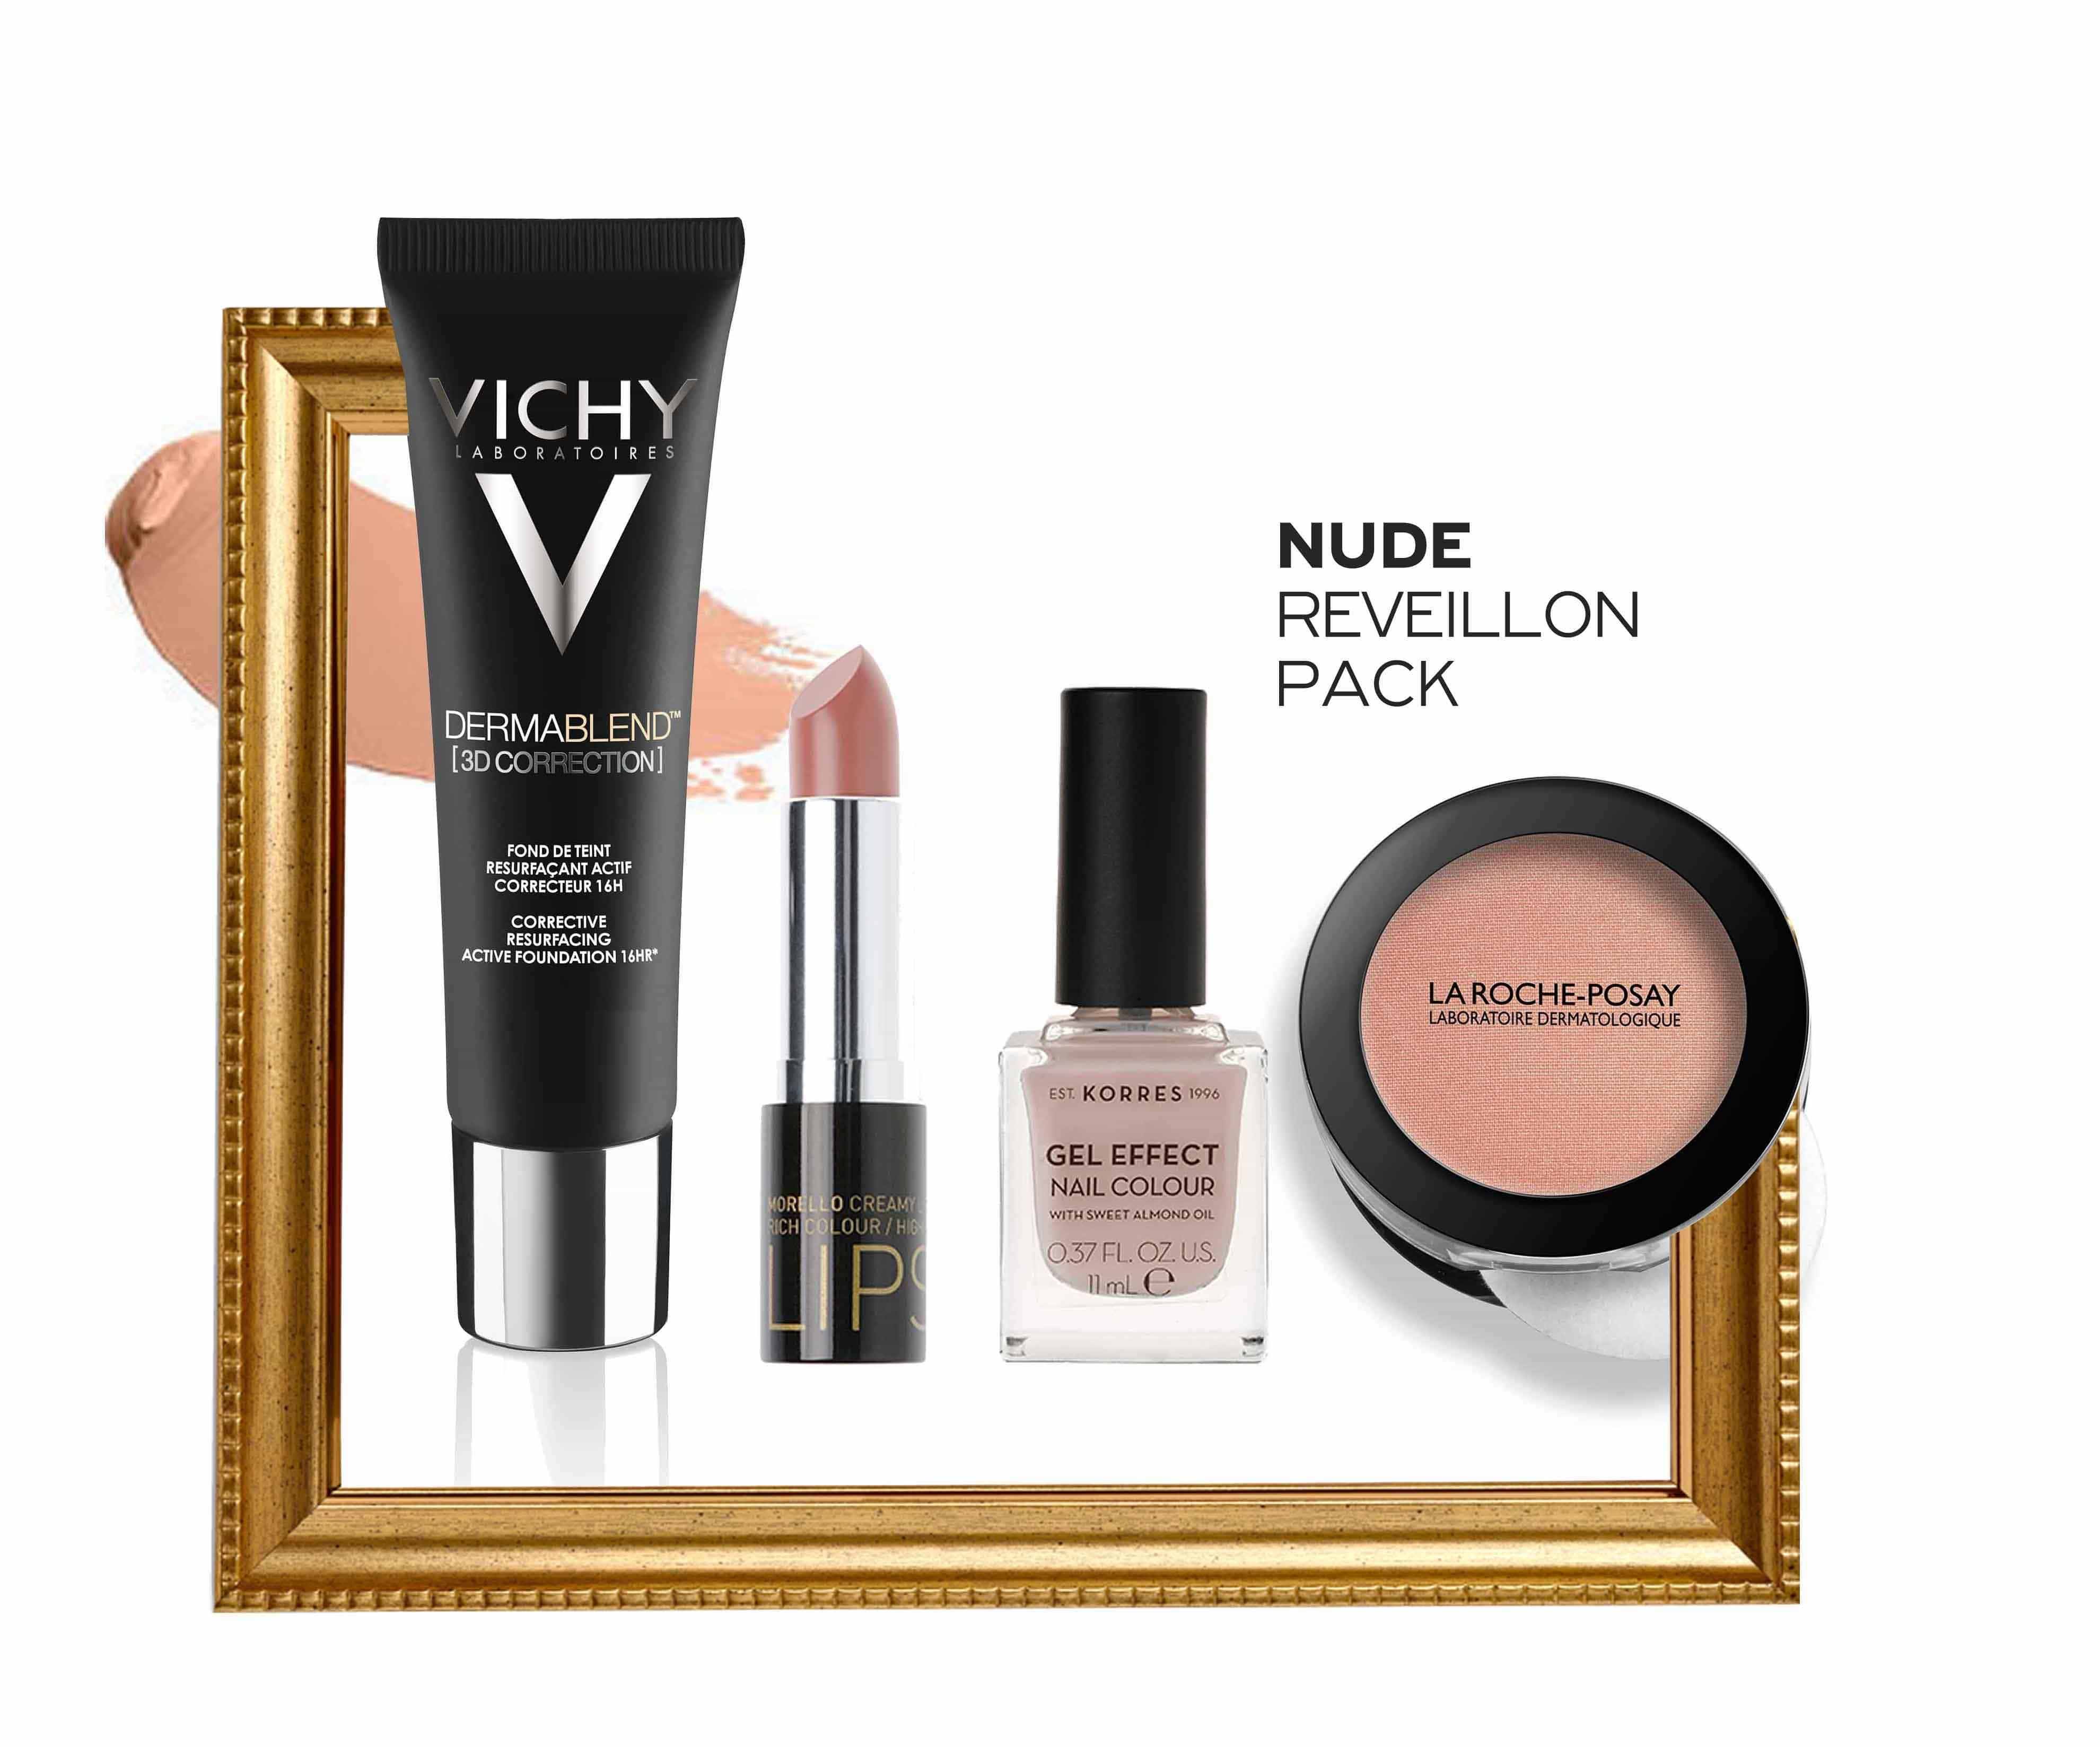 Nude Reveillon Pack με Vichy Dermablend 3D Make Up, 30ml, Morello Creamy Lipstick 04 Honey Nude Κρεμώδες Κραγιόν, 3.5ml, Korres Gel Effect Nail Colour No.31 Sandy Nude Βερνίκι Νυχιών, 11ml & La Roche Posay Toleriane Teint Blush No. 03 Ρουζ, 5gr